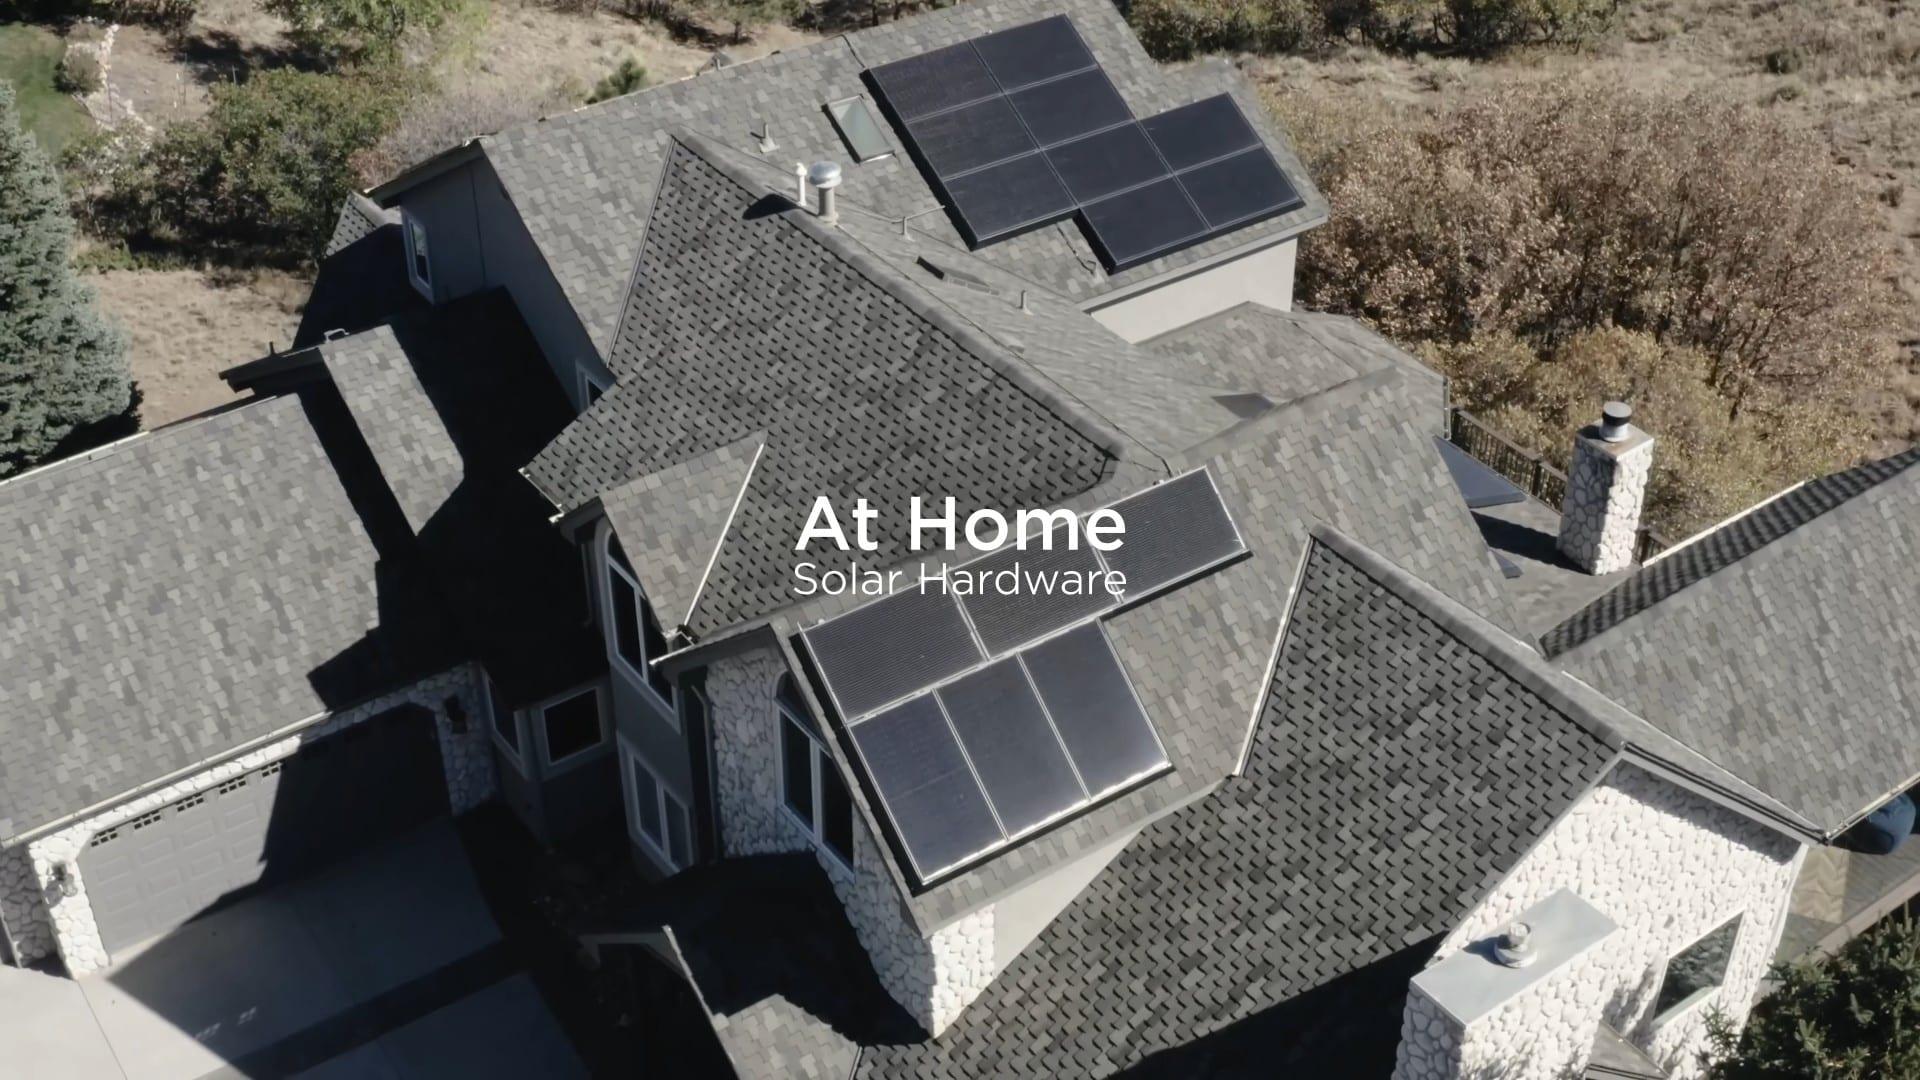 Solar Hardware – Nέα γενιά ηλιακά της Tesla